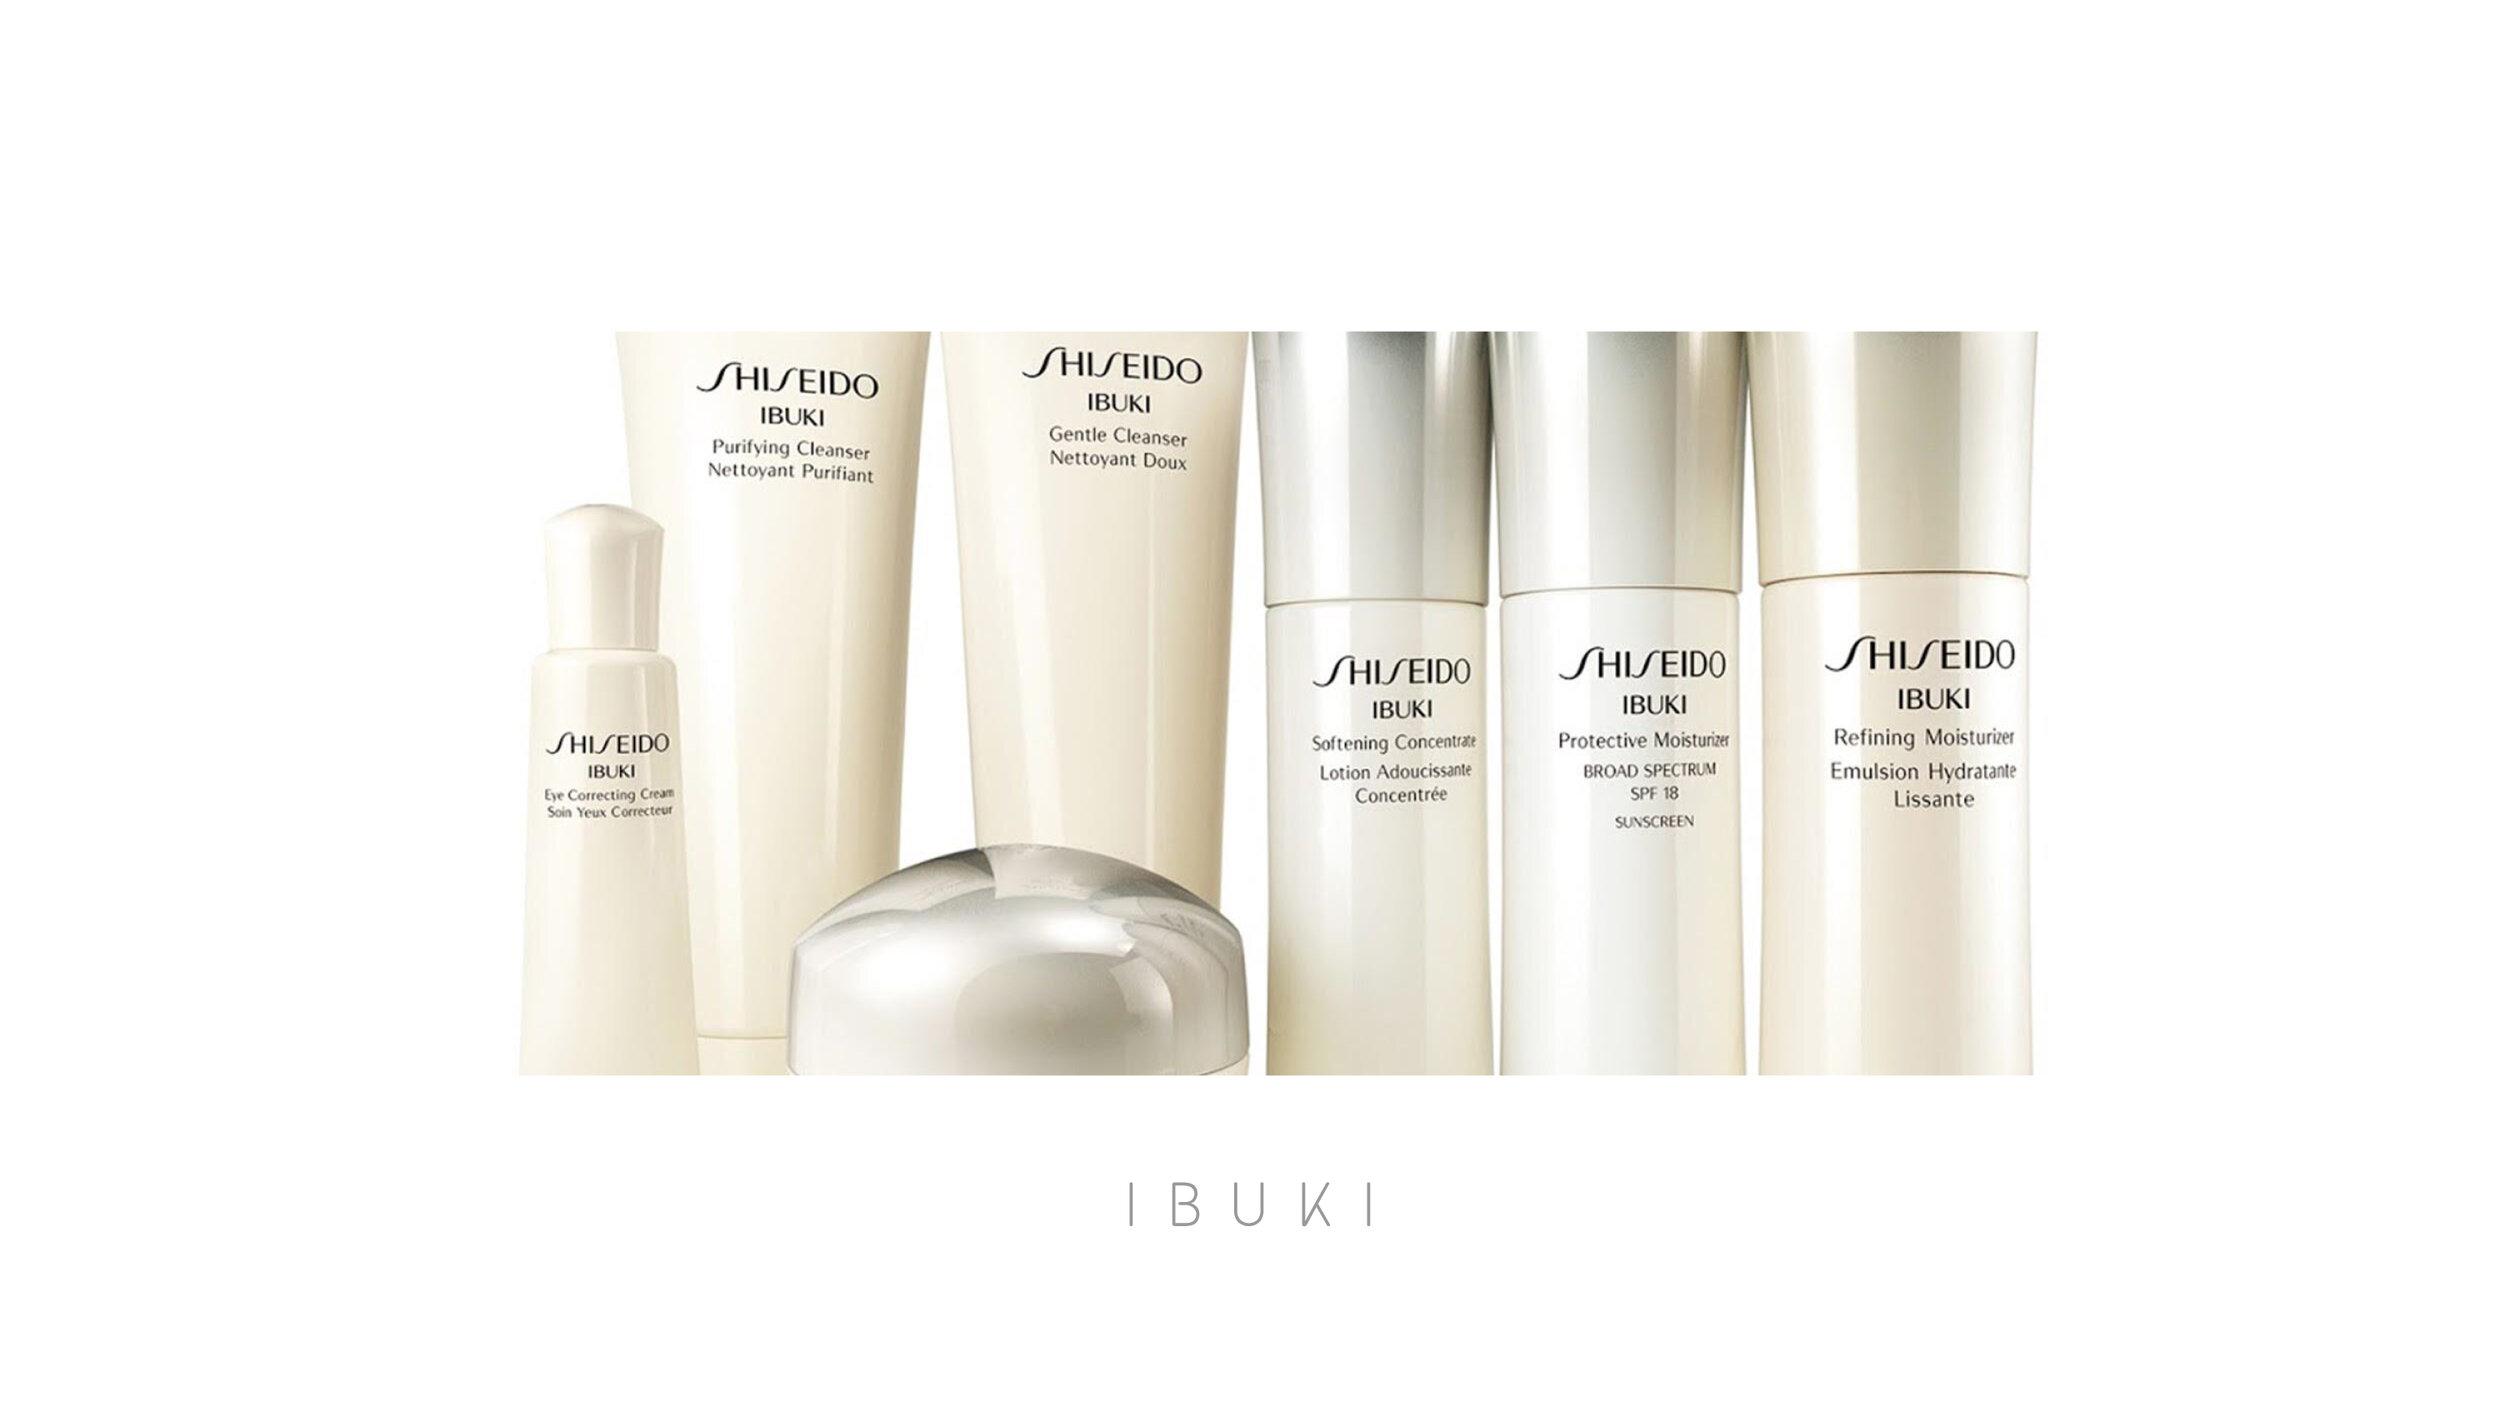 shiseido_brandbook_ibuki1.jpg